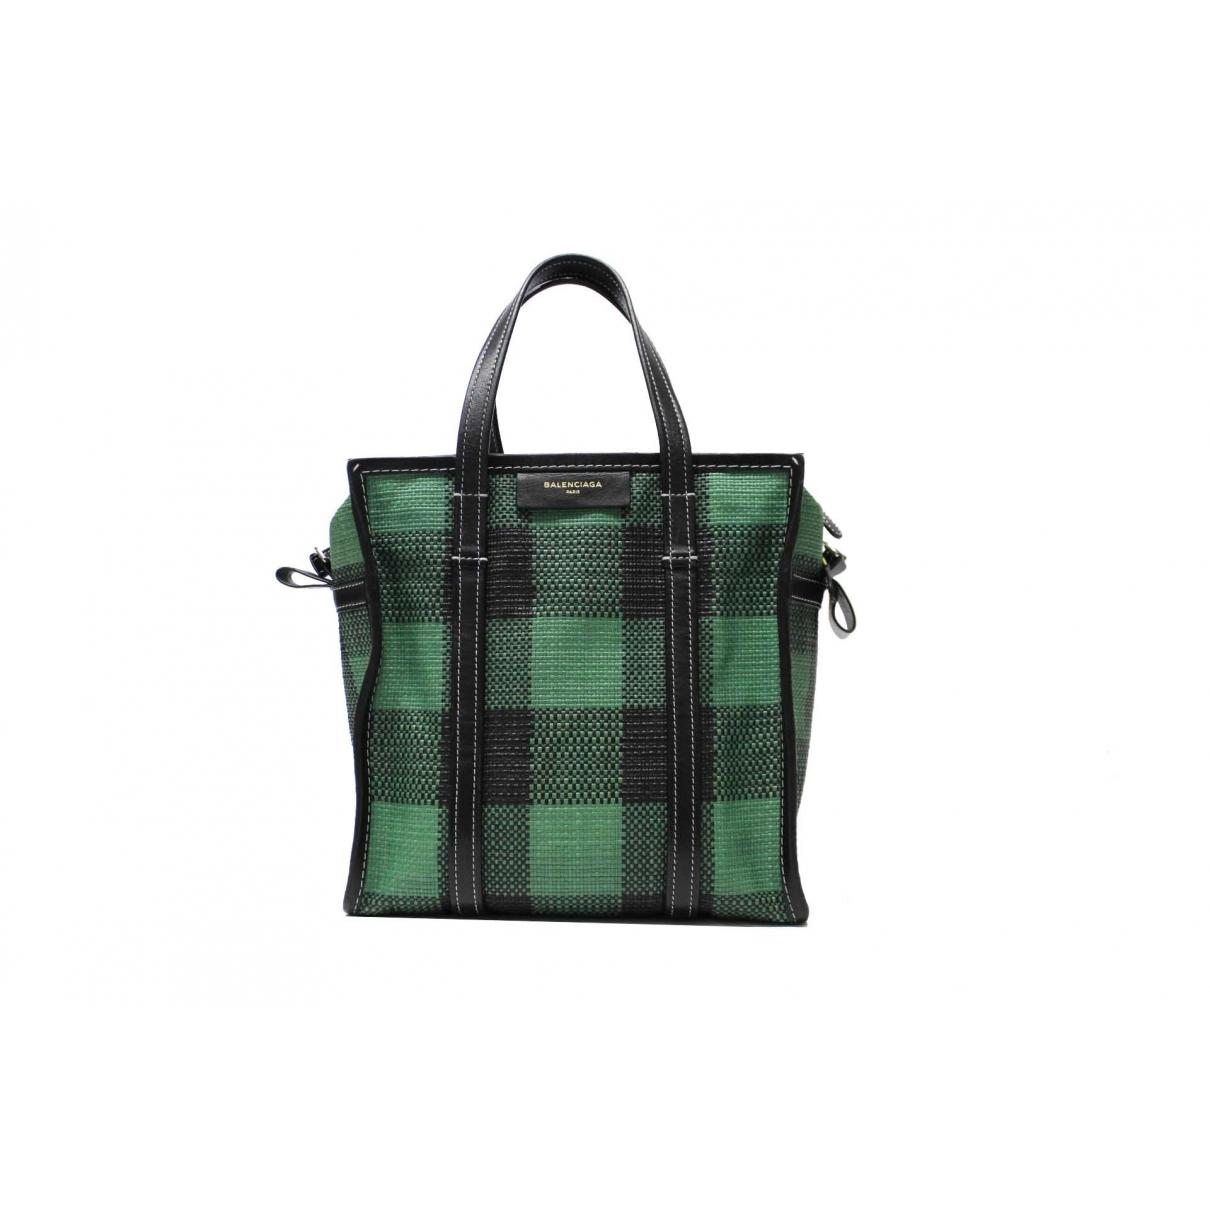 Balenciaga \N Handtasche in  Gruen Leinen